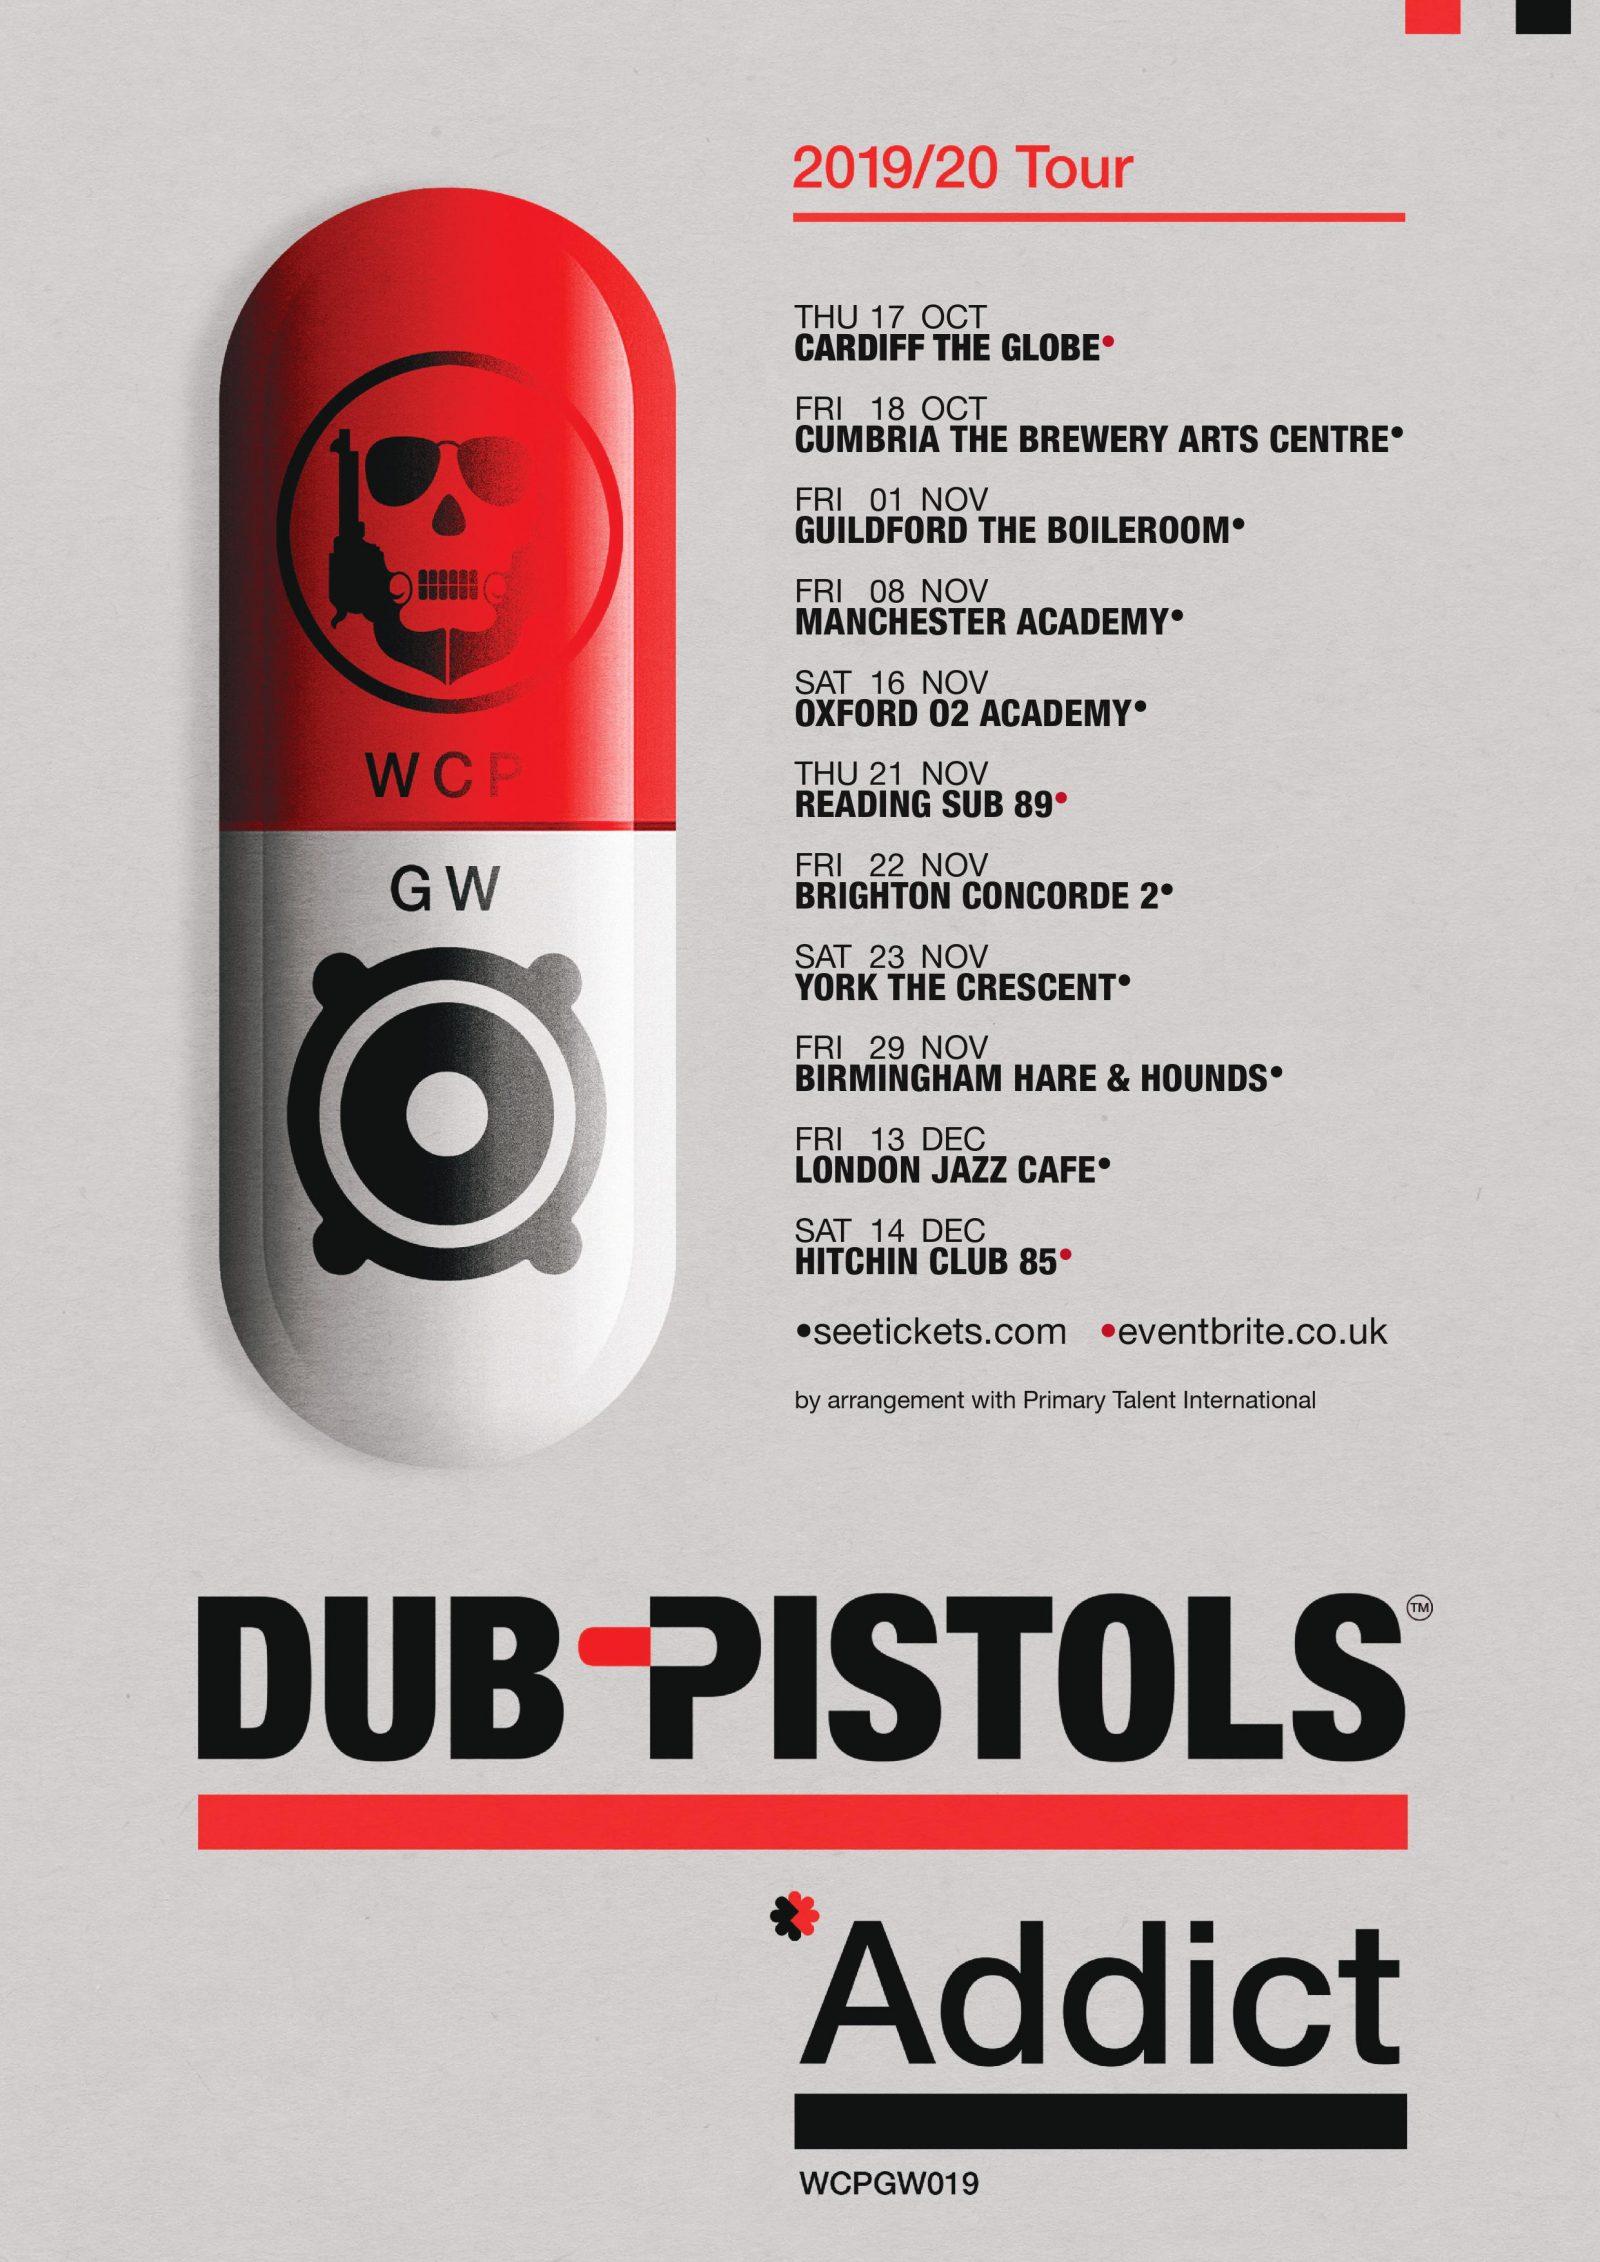 Dub Pistols – Dub Pistols news, music, photos and tour dates